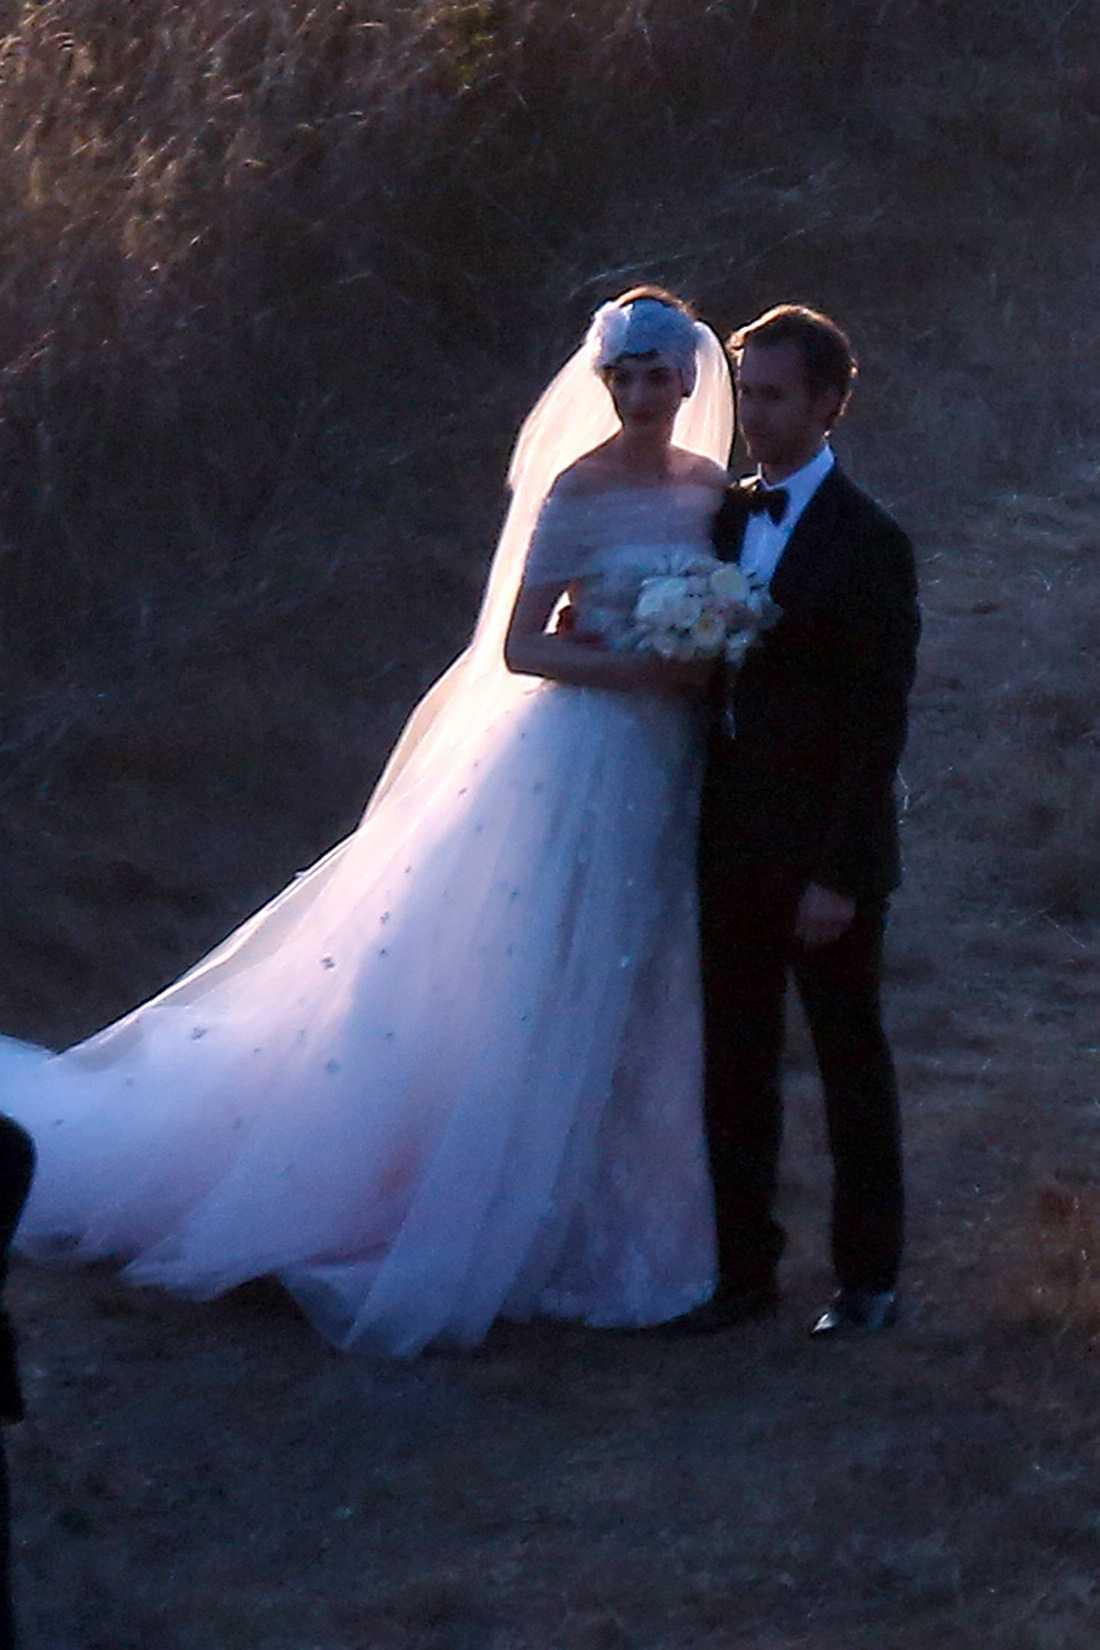 Bröllopet ägde rum i Big Sur i Kalifornien.